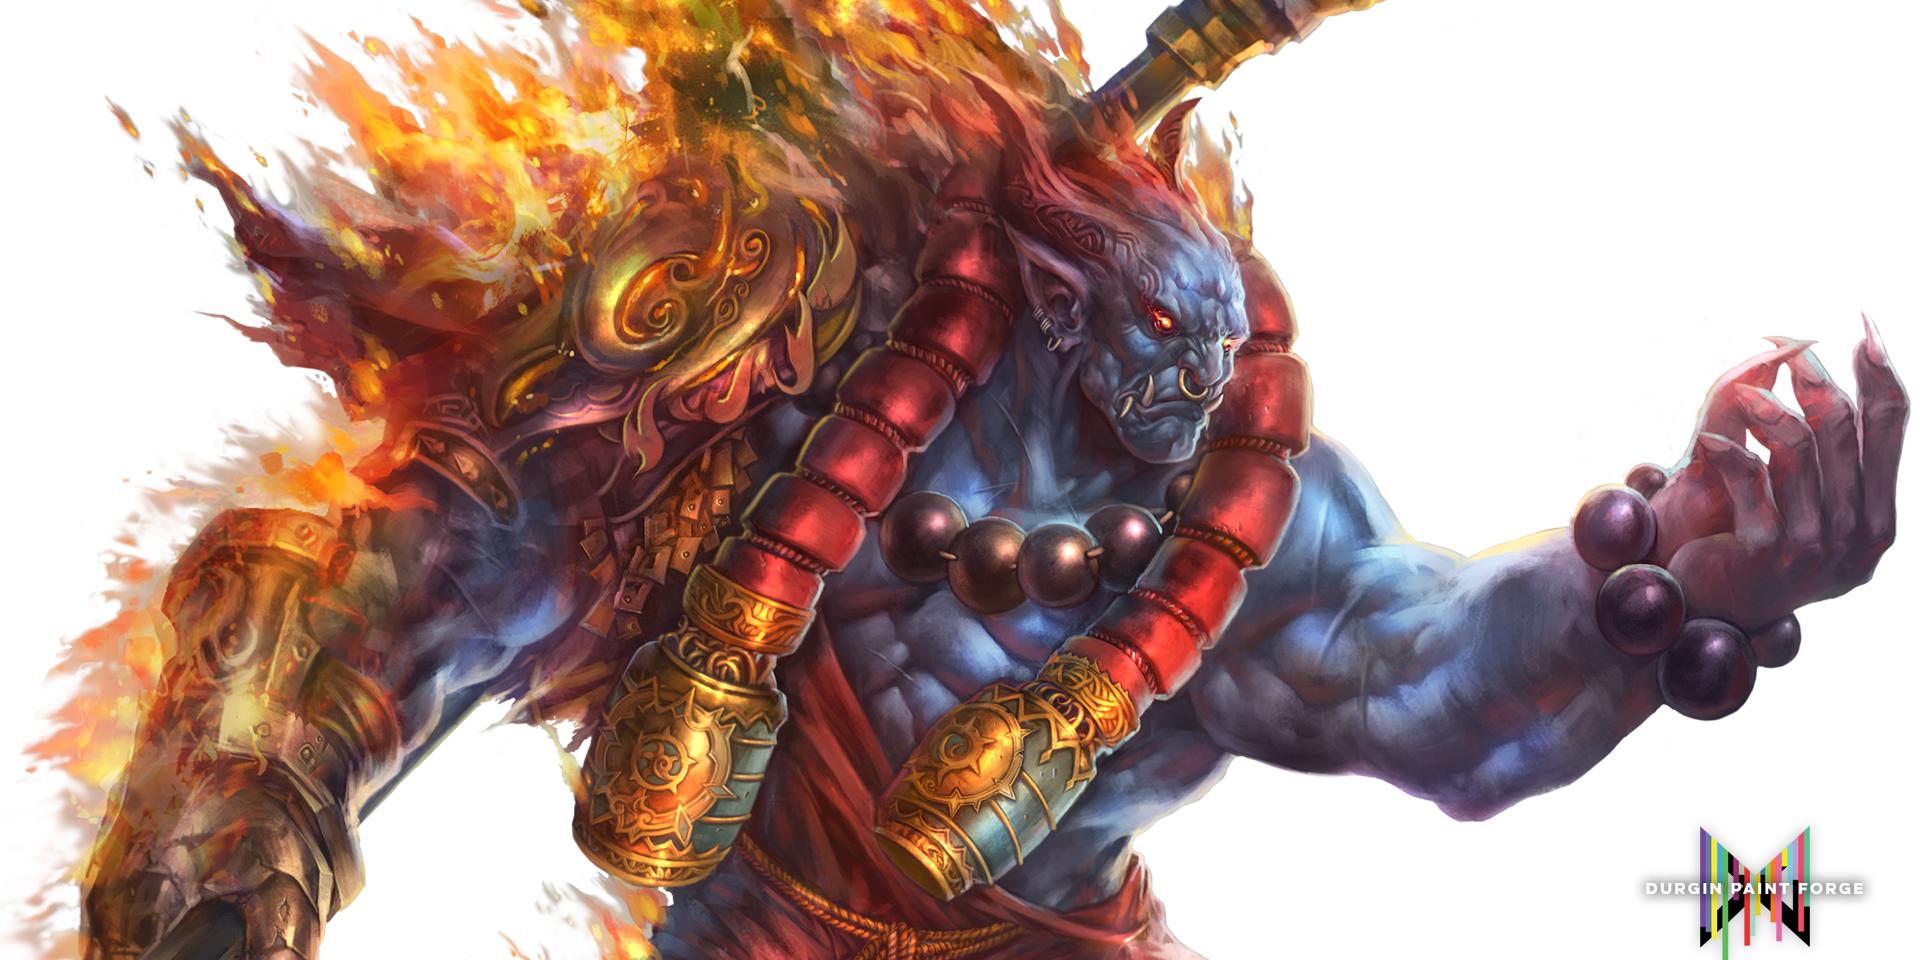 Ikari of Fire (desktop)